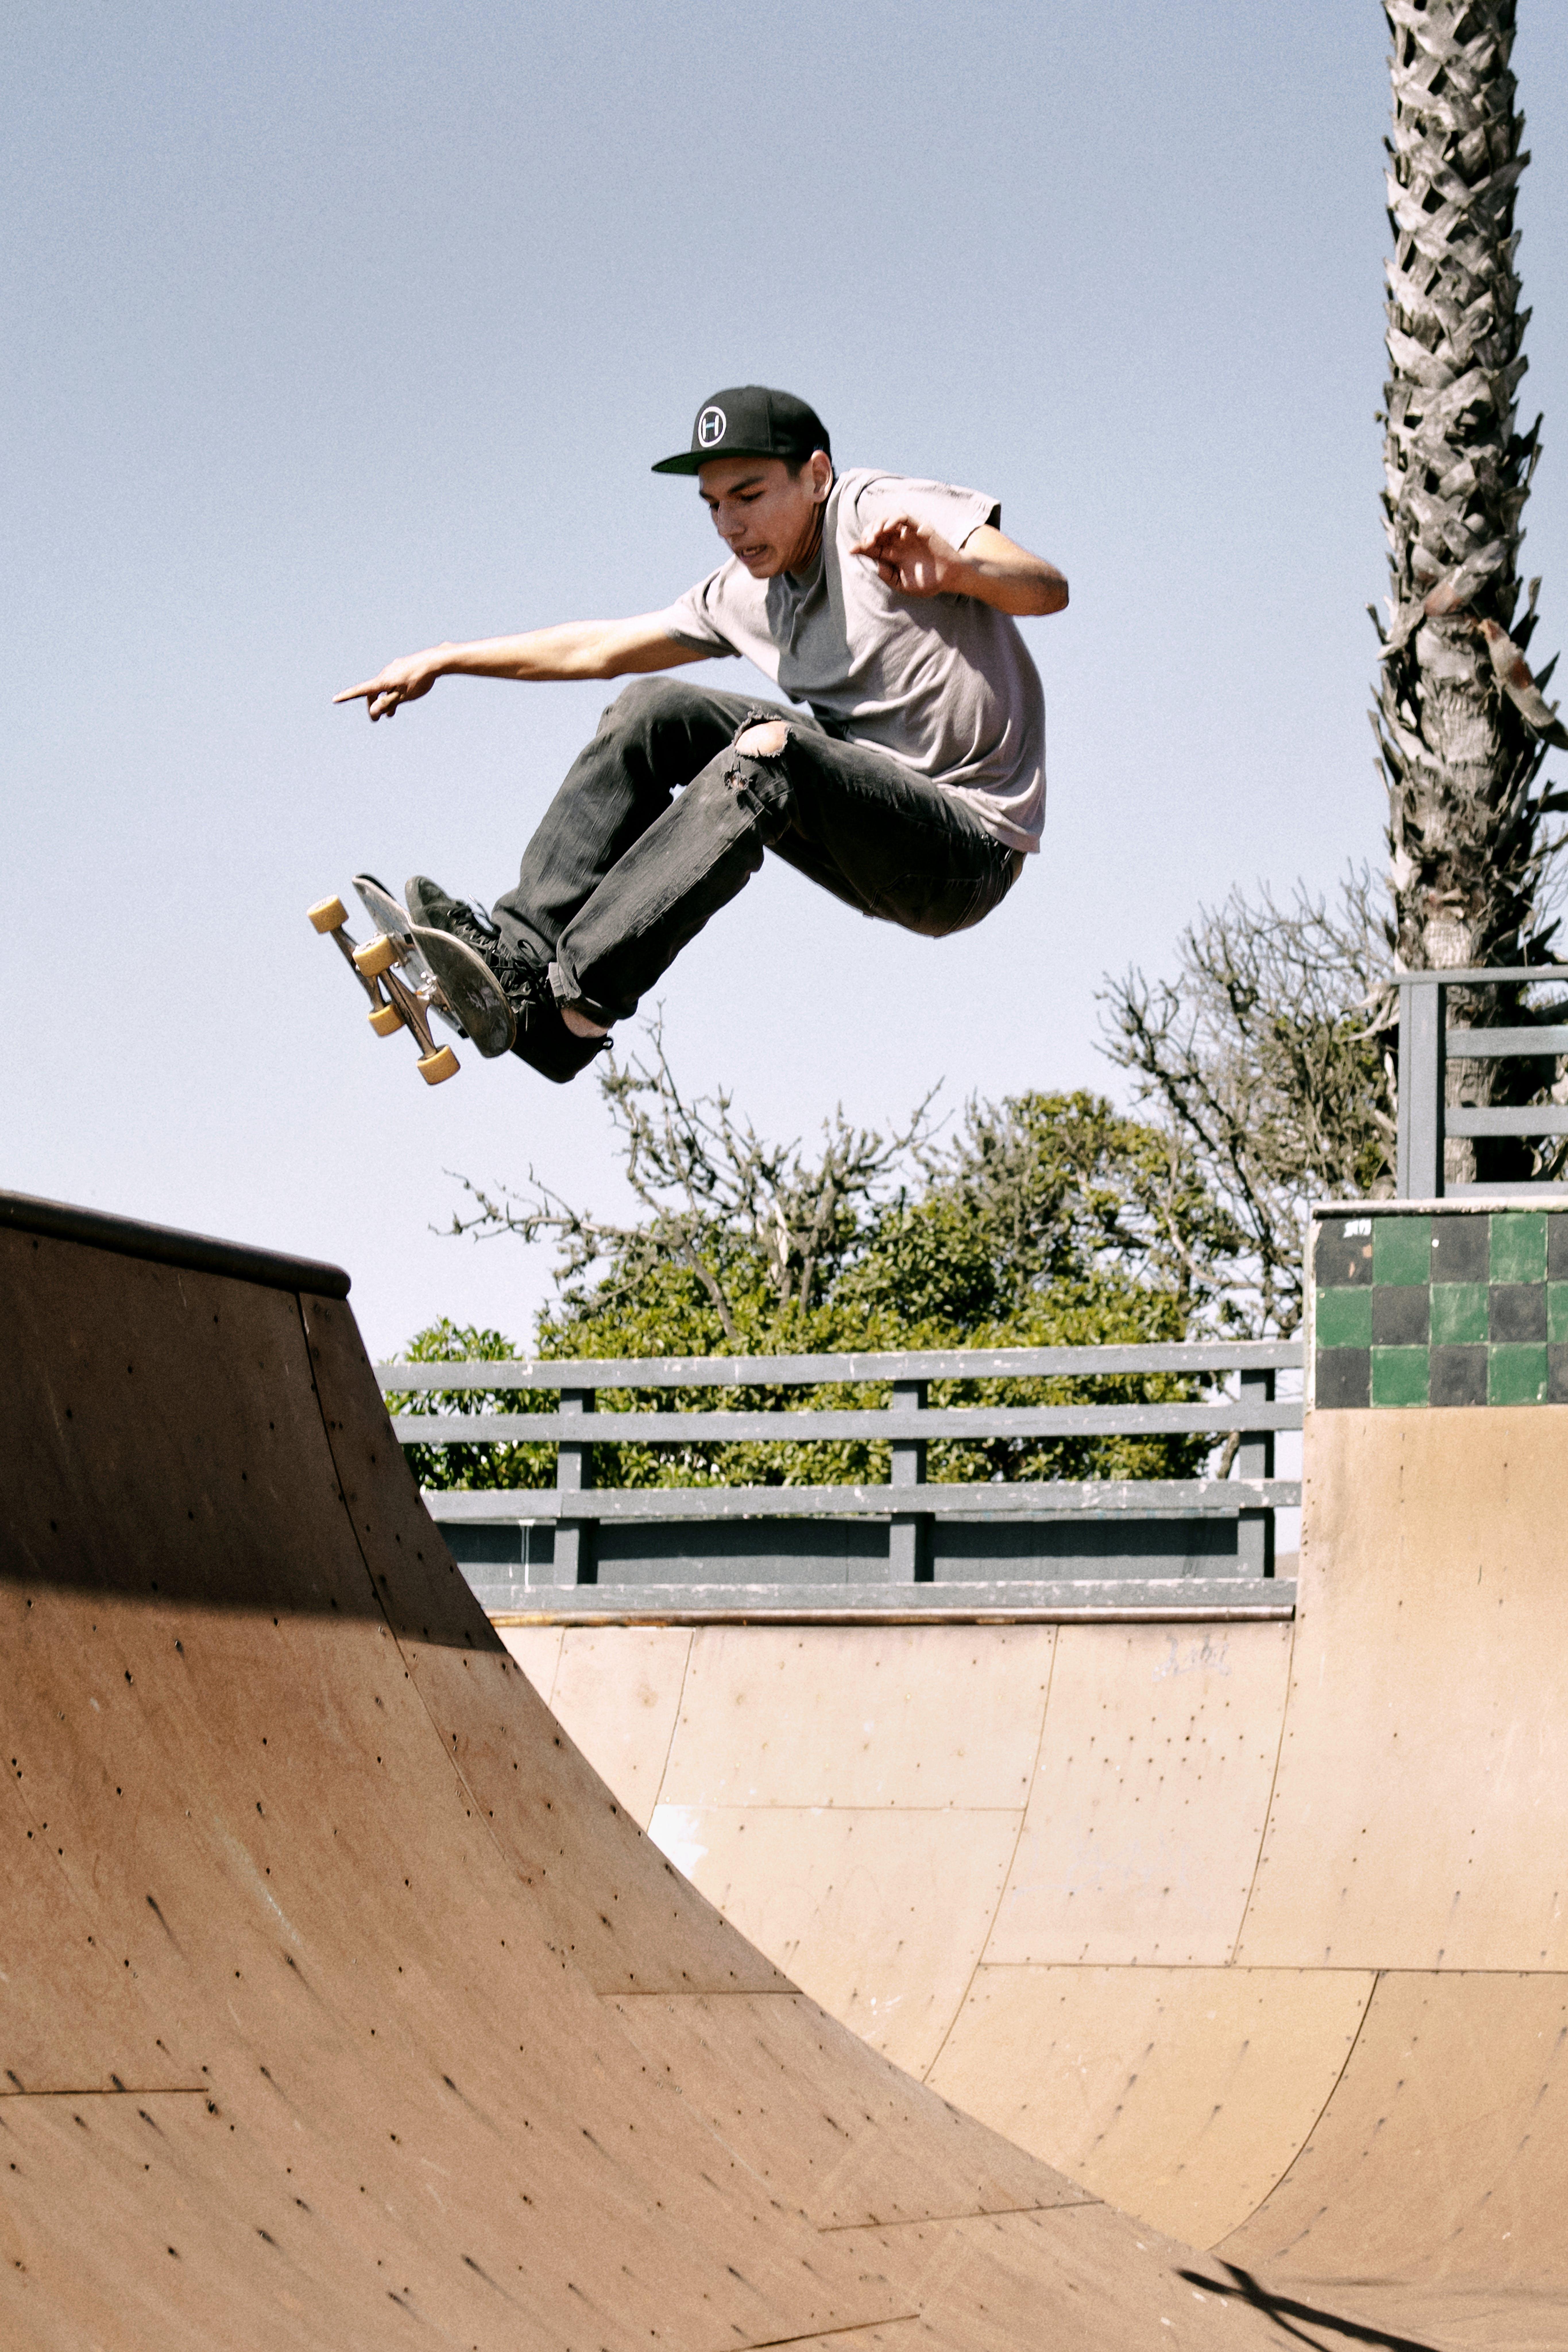 Person Skating on Skateboard Ramp